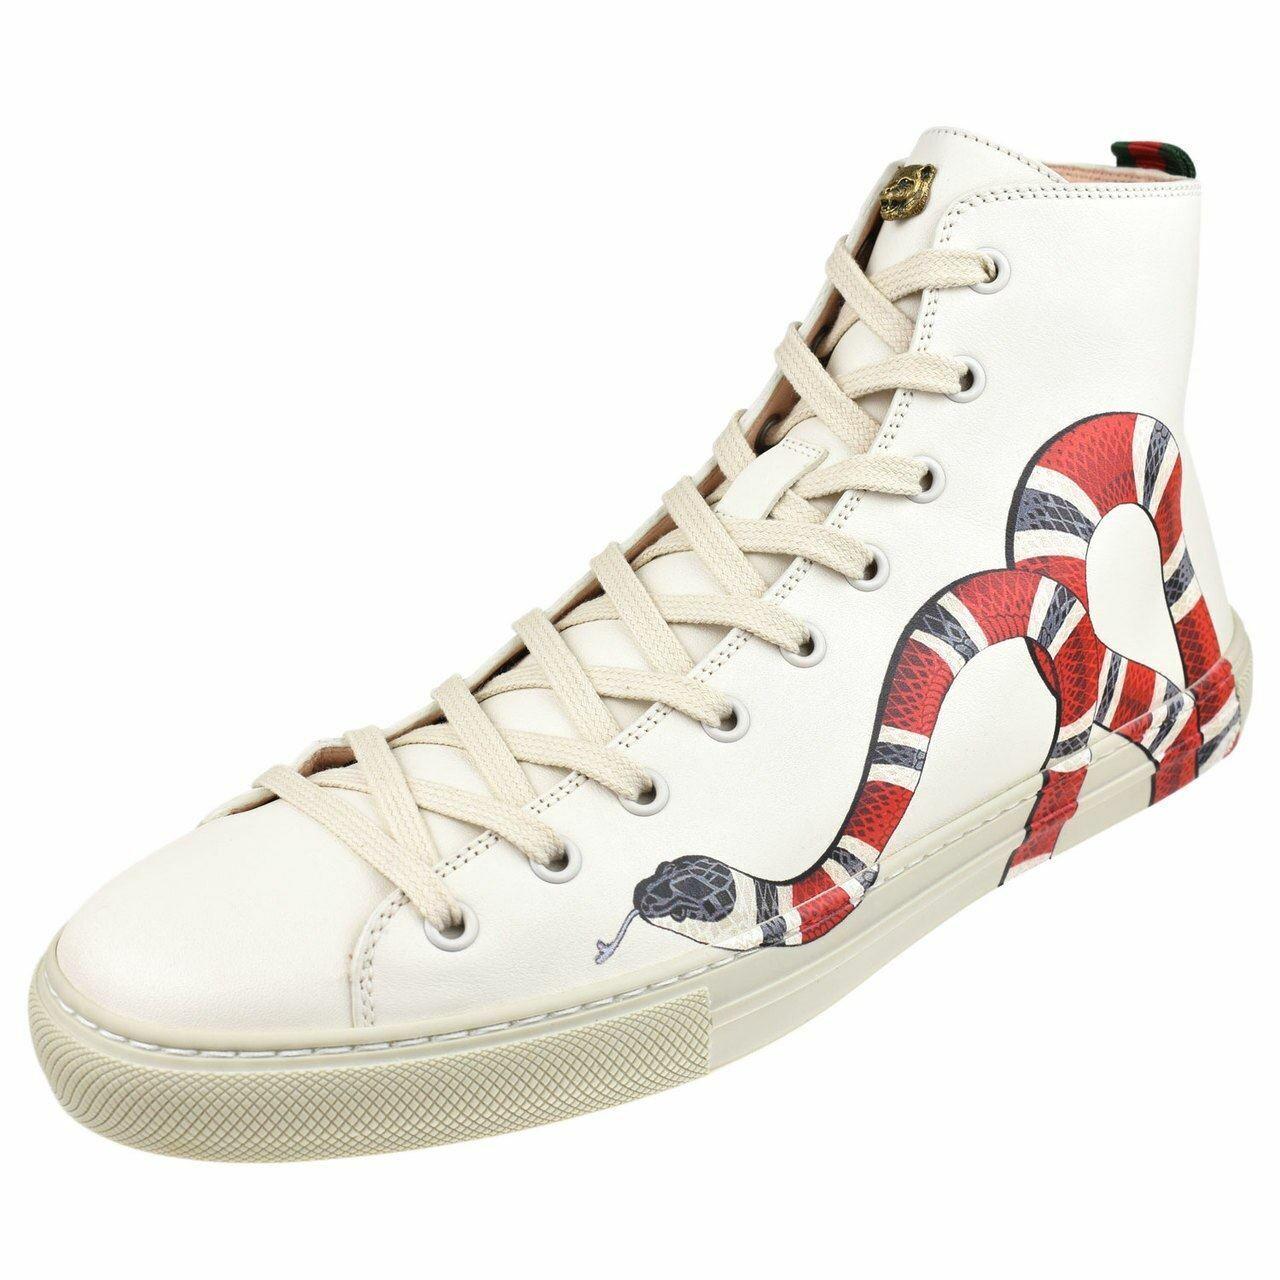 Gucci Mens Shoes Major Snake High Top Sneaker 473739-Ayov0-9050